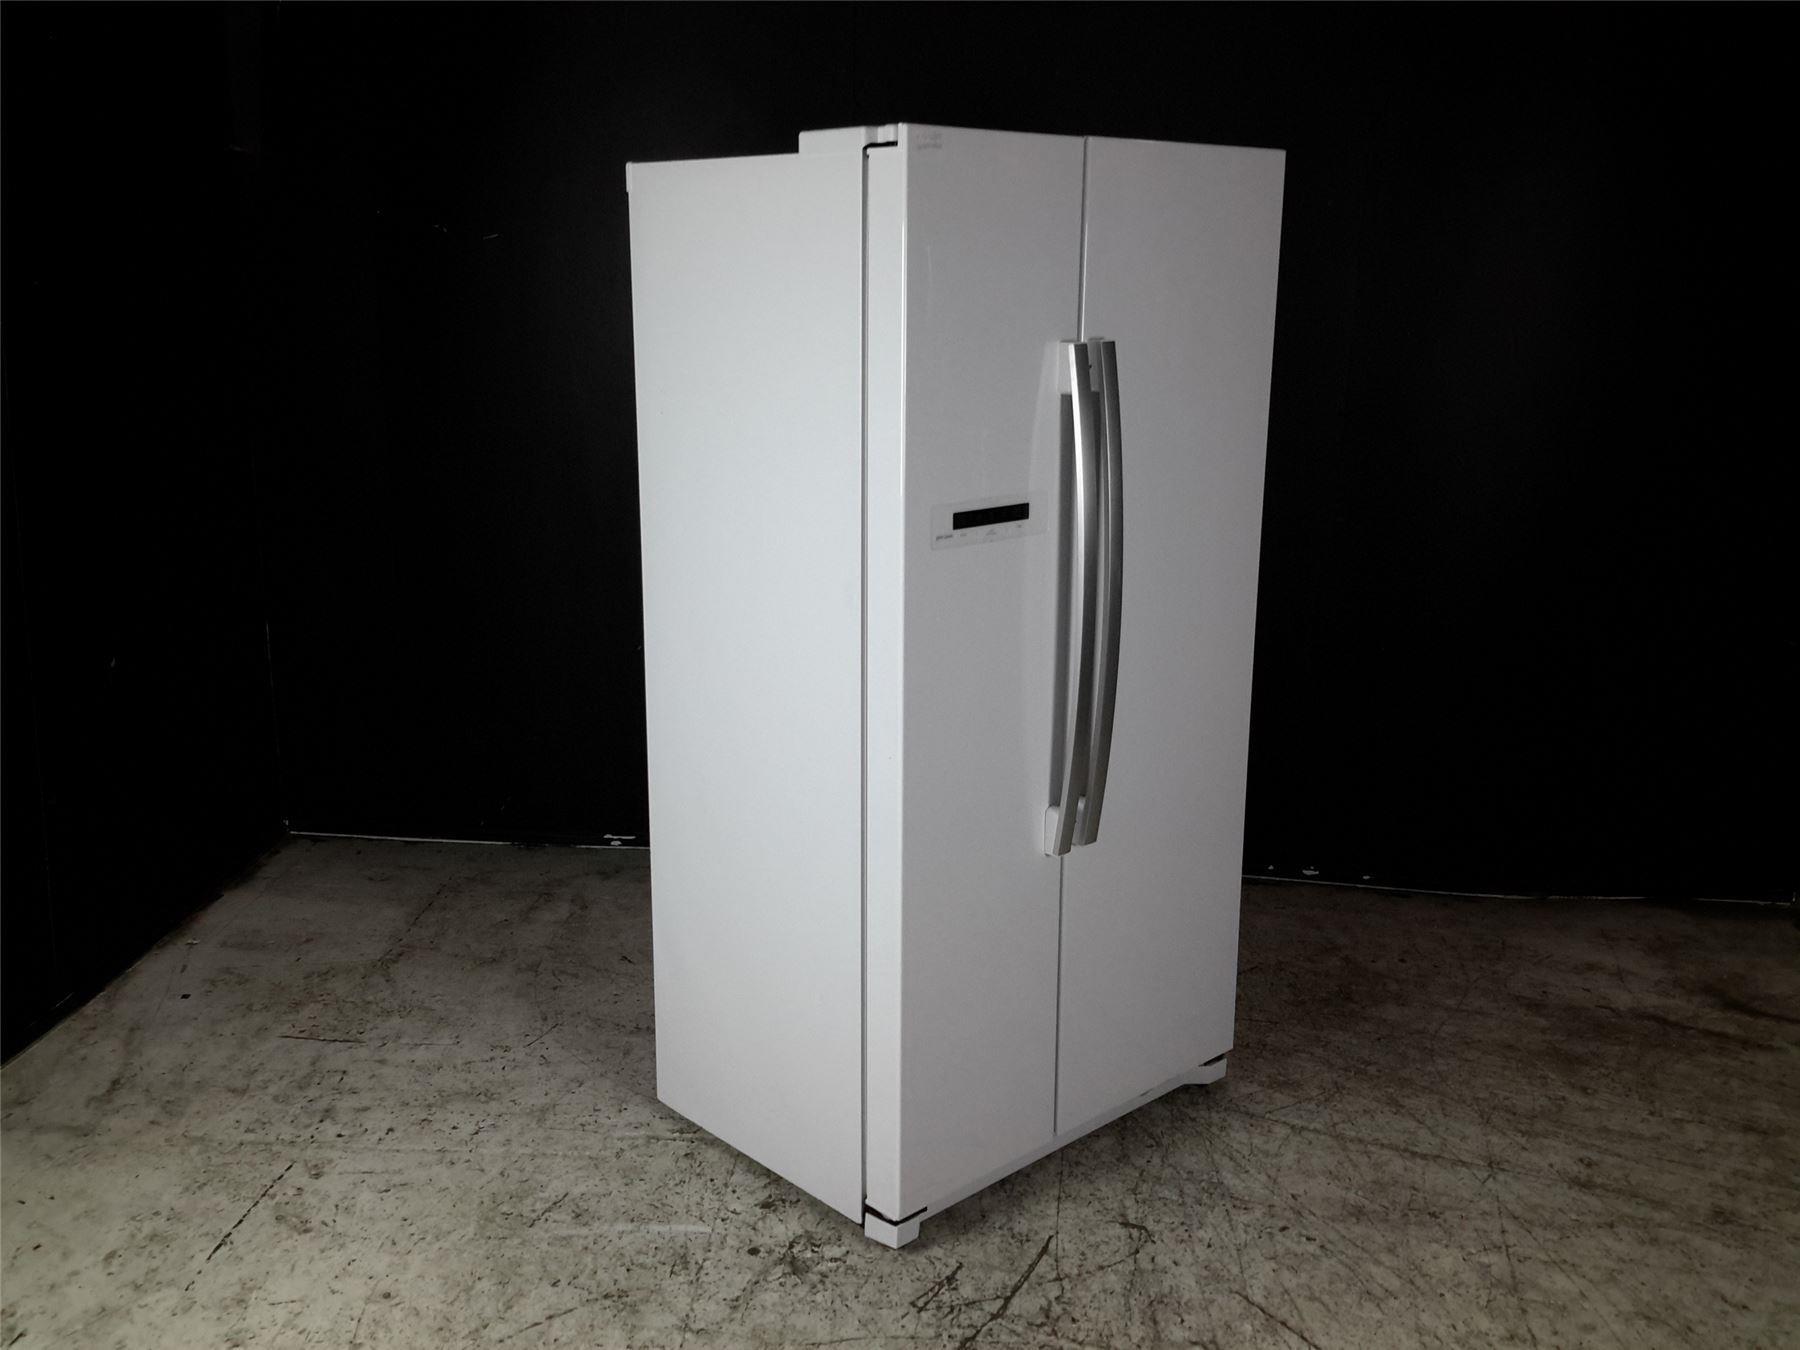 jlaffw2012 american style fridge freezer white online store. Black Bedroom Furniture Sets. Home Design Ideas